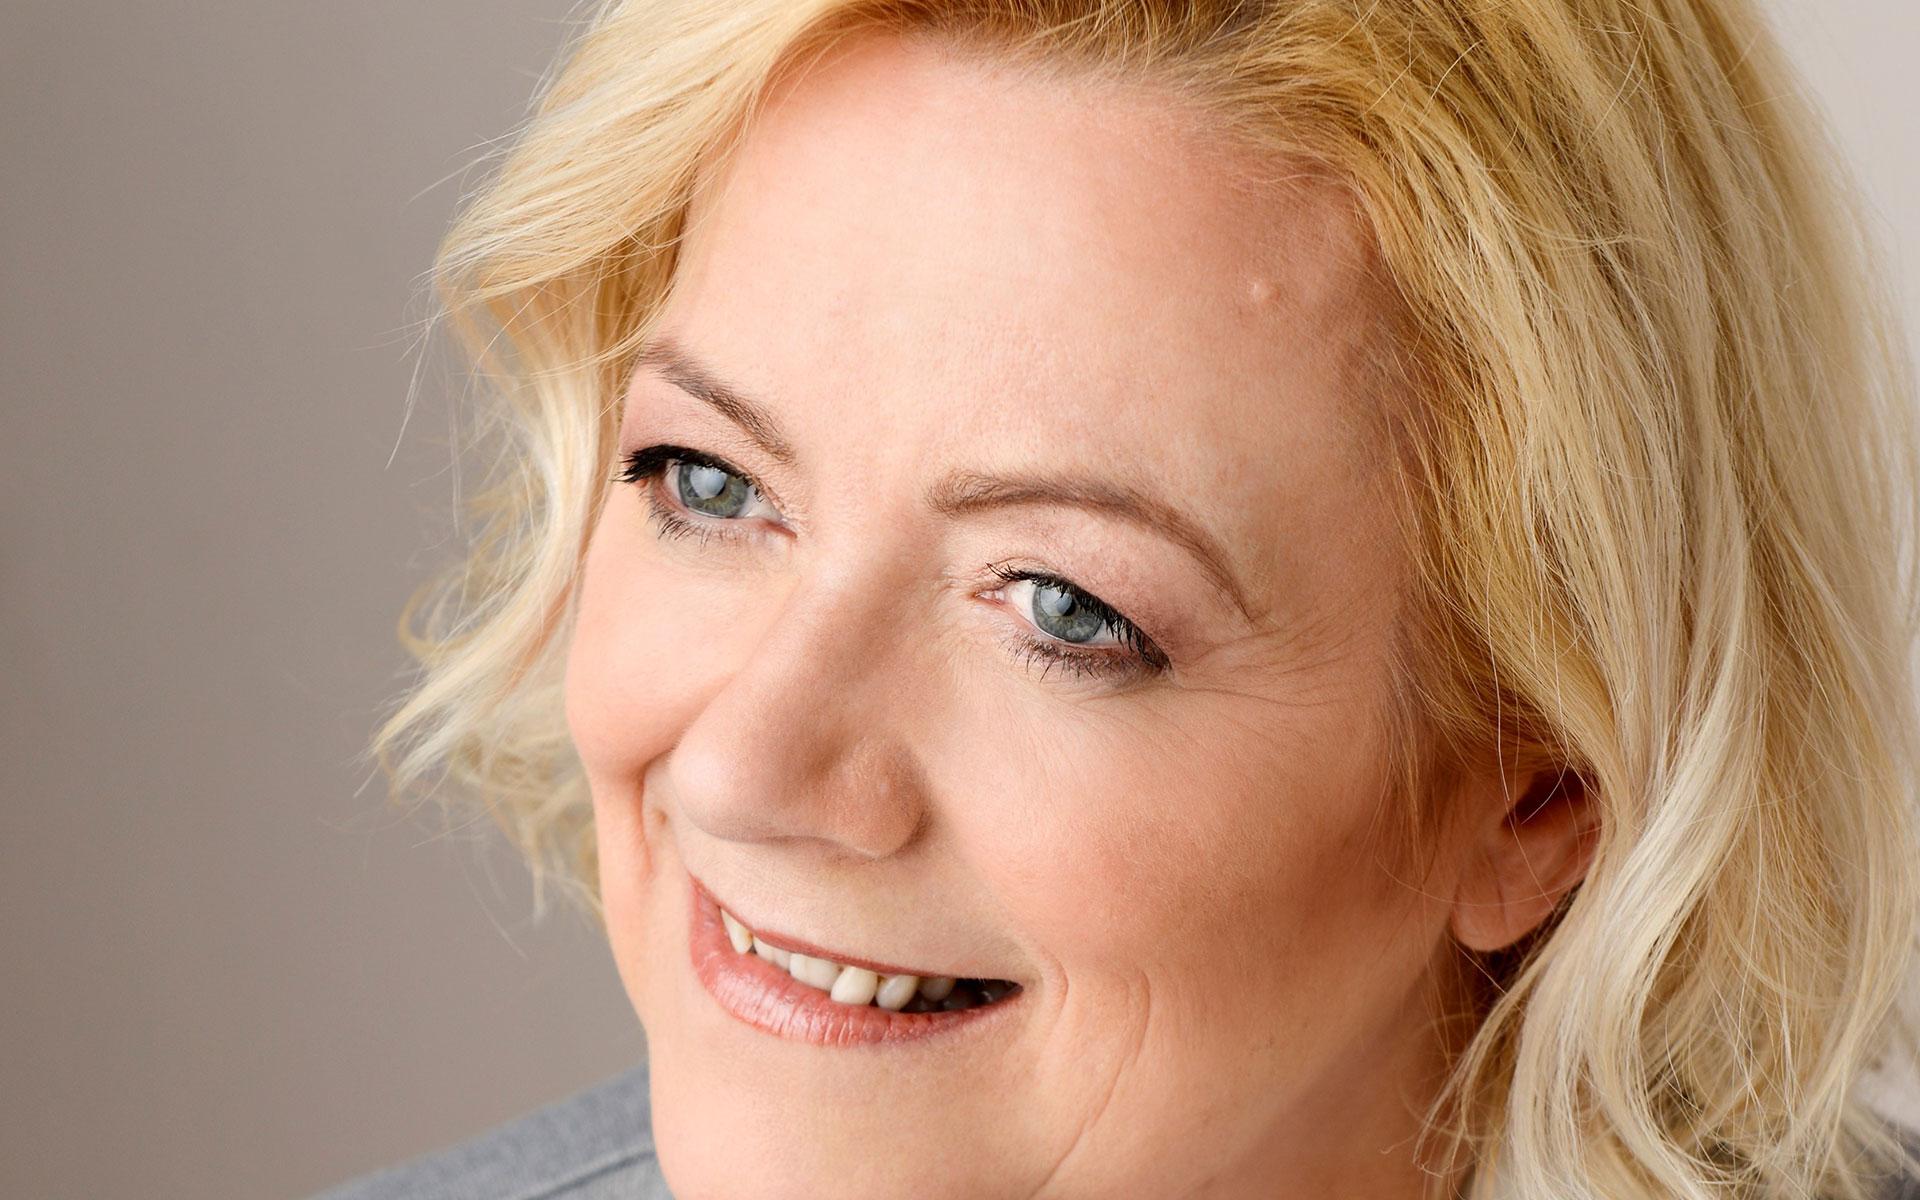 Psykoterapeut Pia Halsted i Svendborg